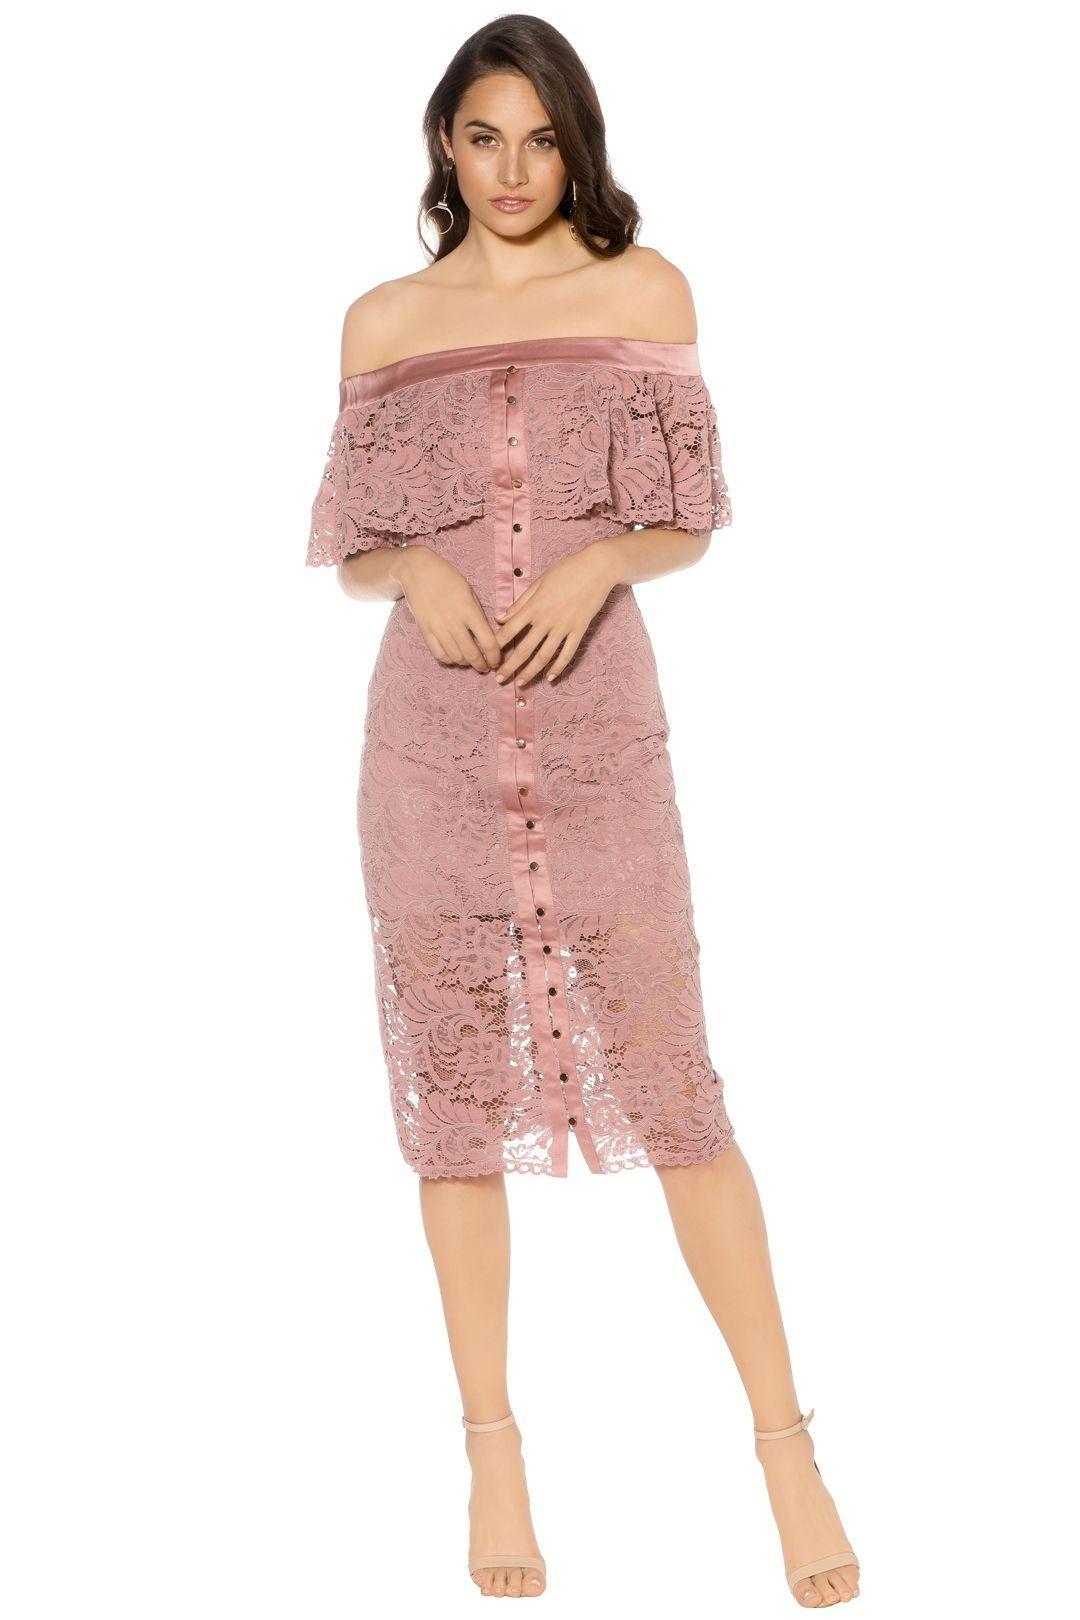 Keepsake The Label - Star Crossed Lace Midi Dress - Mauve - Front